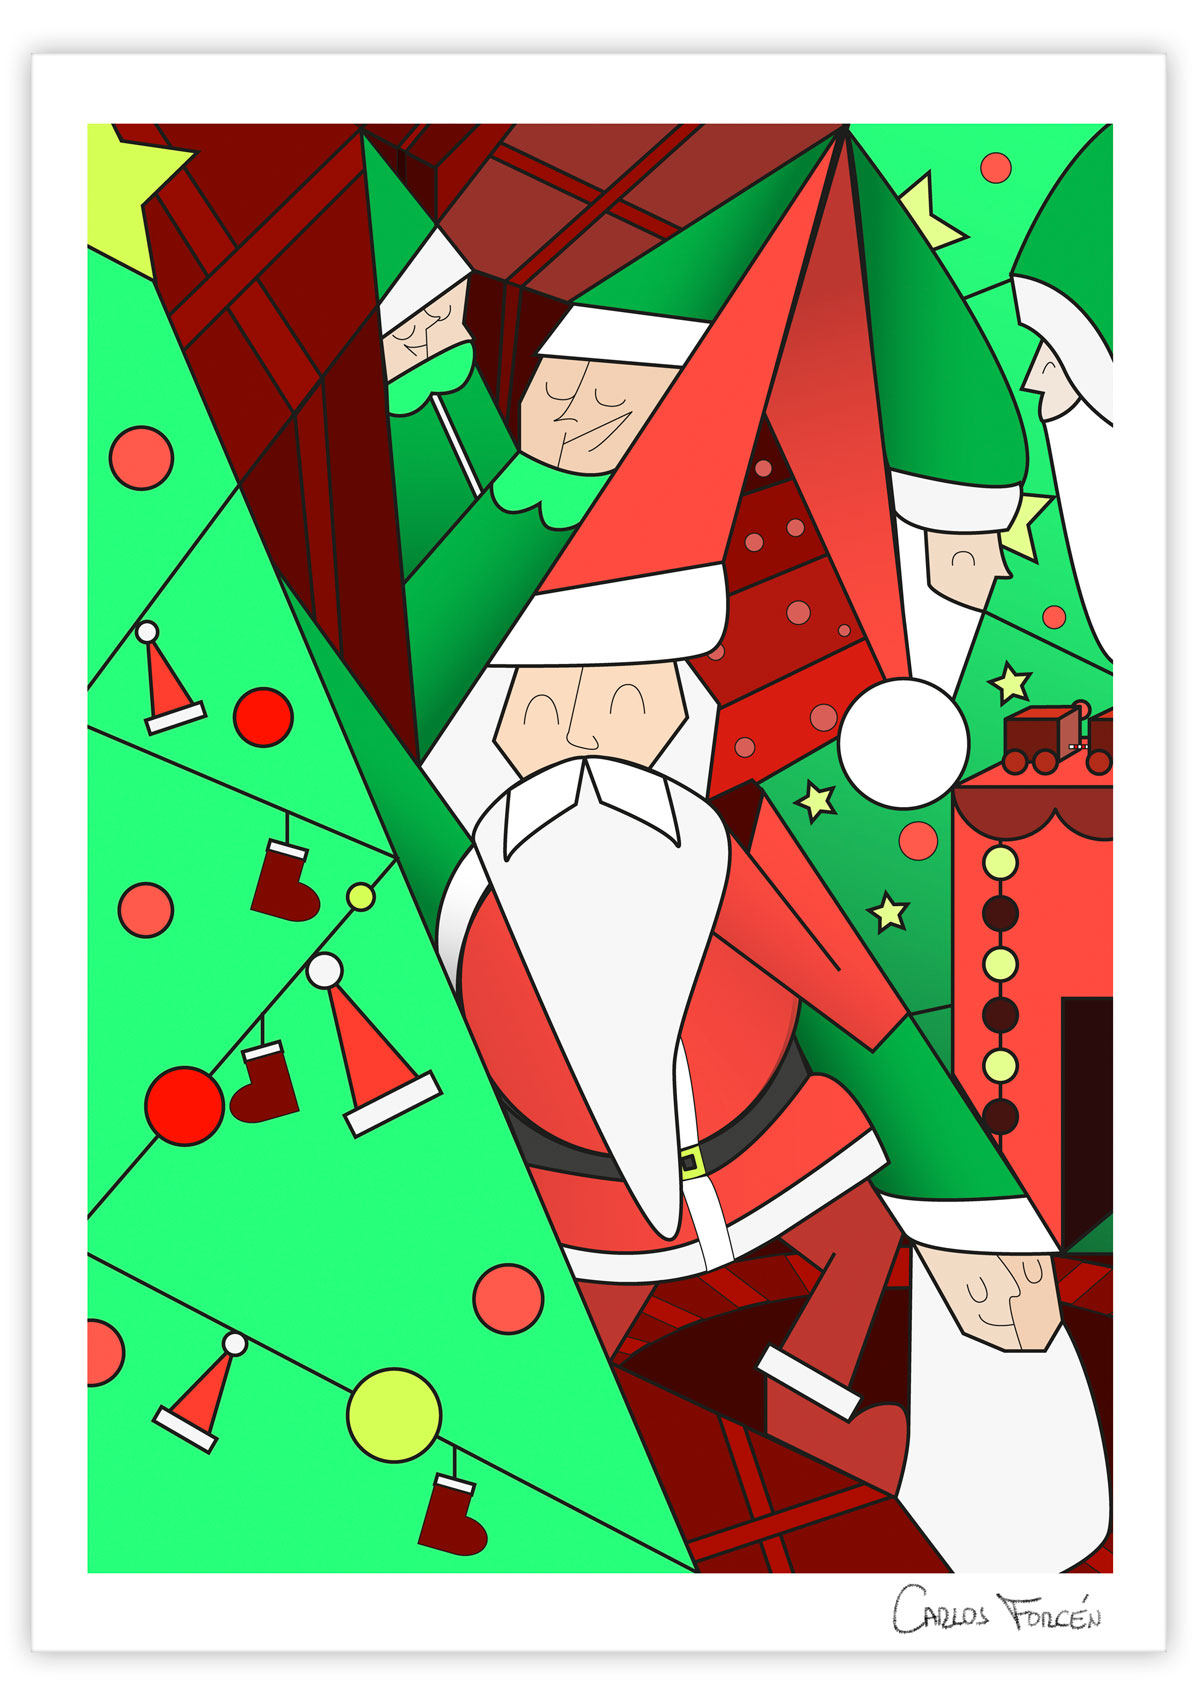 Santa Christmas - Carlos Forcen